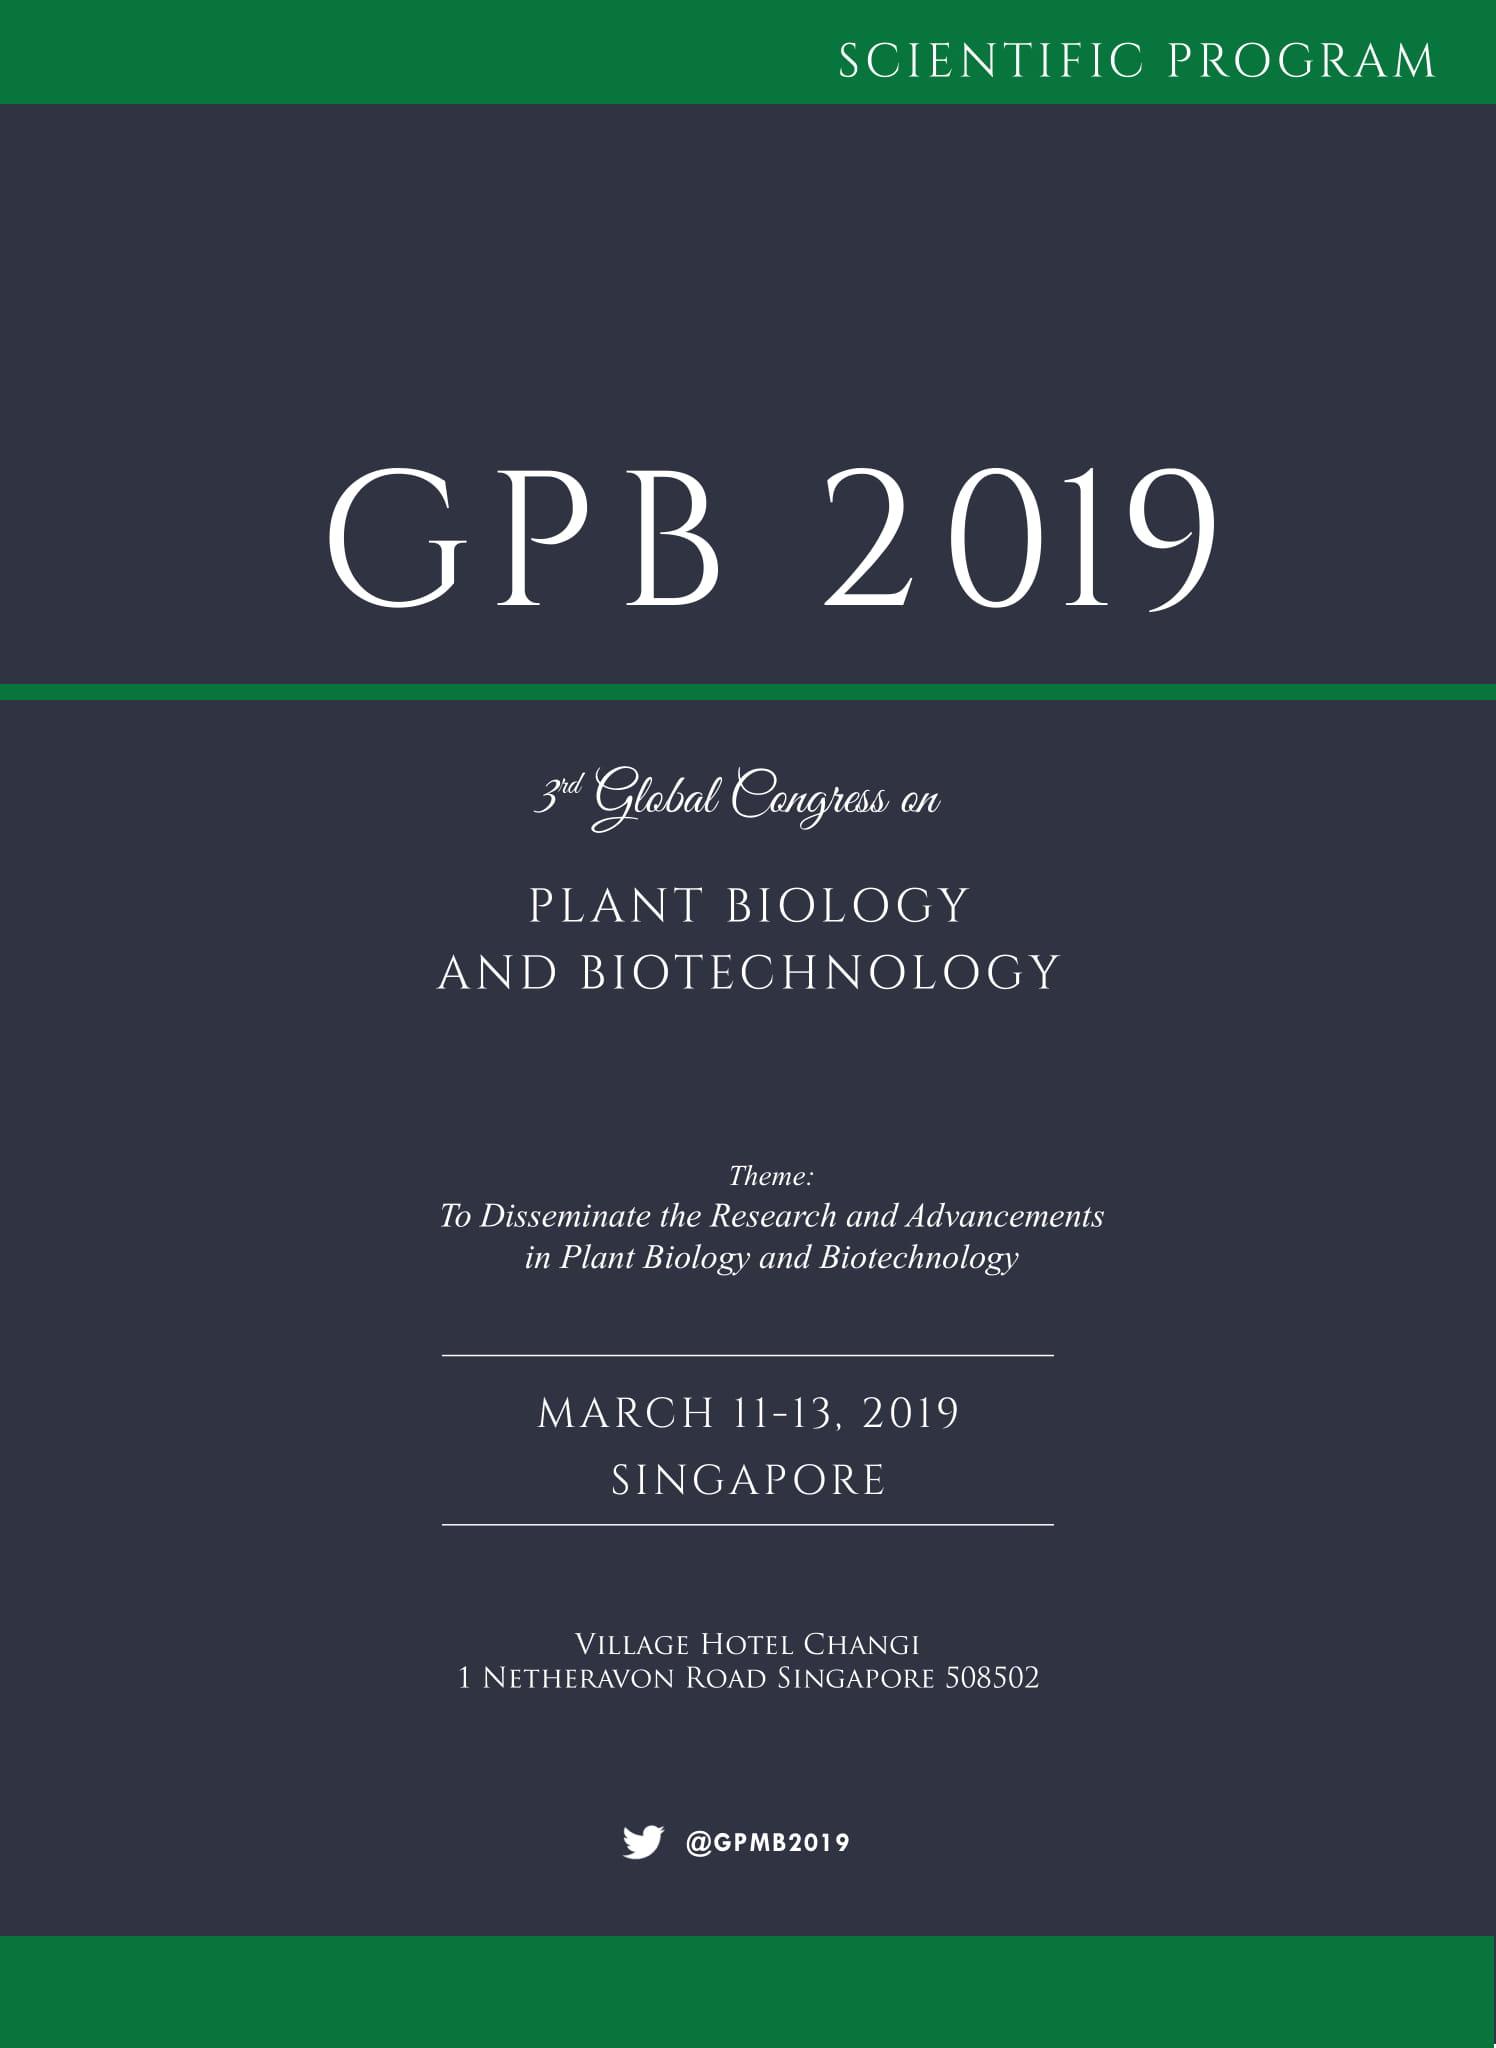 Plant Biology and Biotechnology | Singapore Program